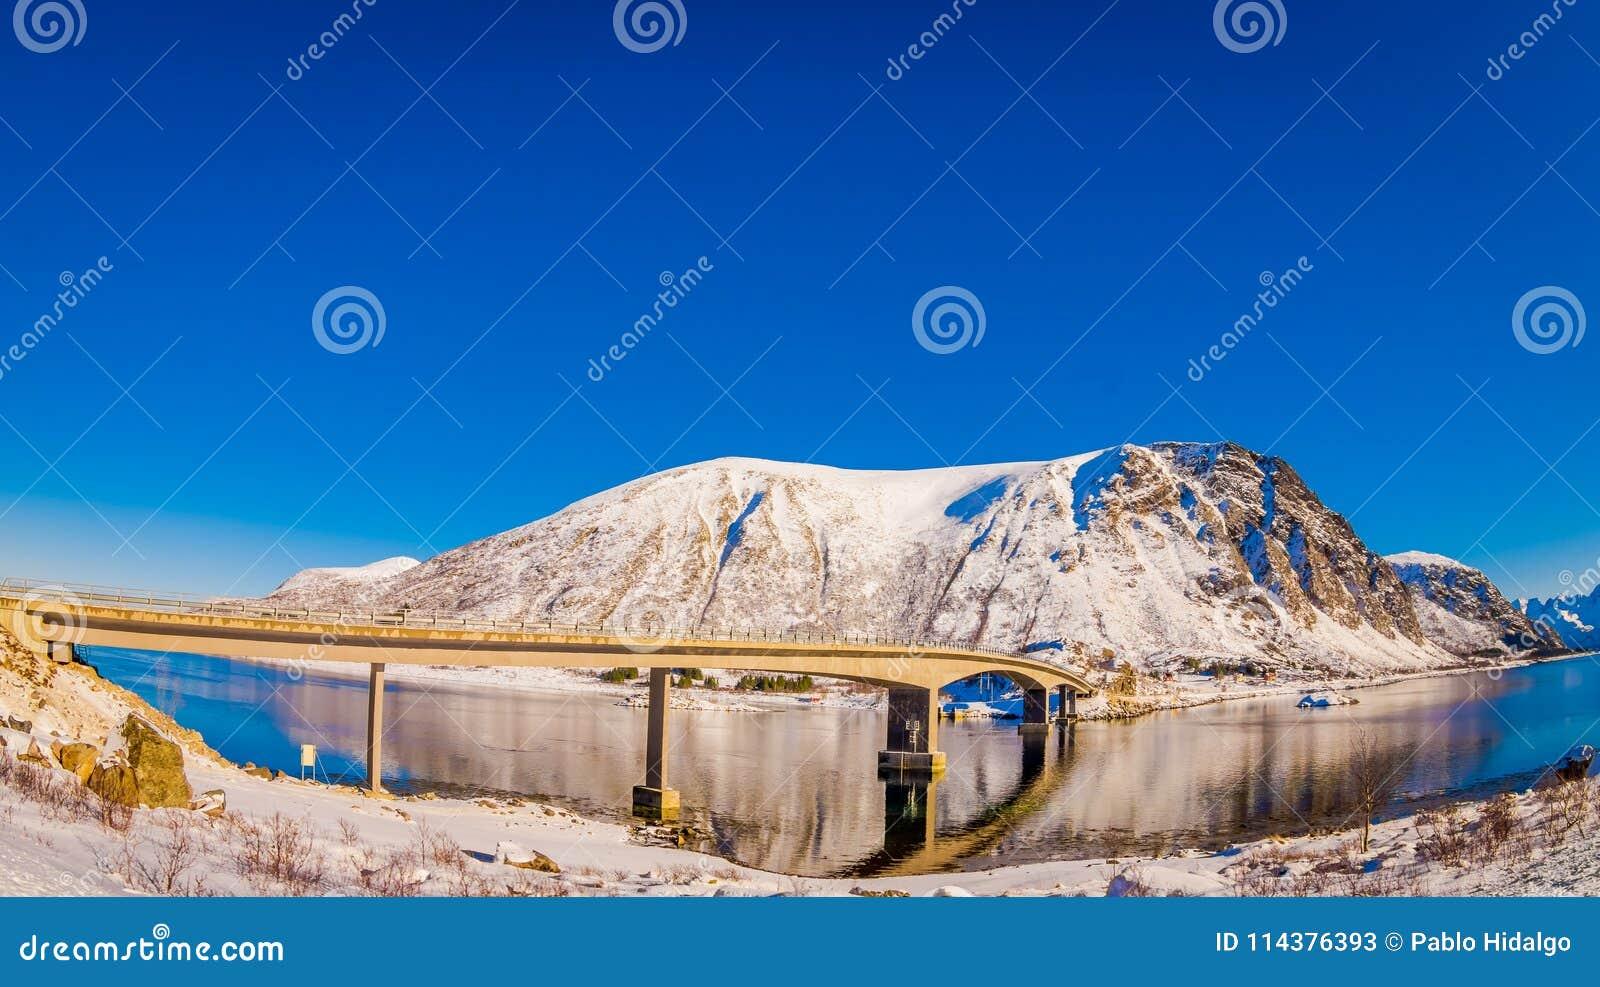 Gimsoystraumen桥梁美好的室外看法是横渡在海岛之间的海峡的一条悬臂式路